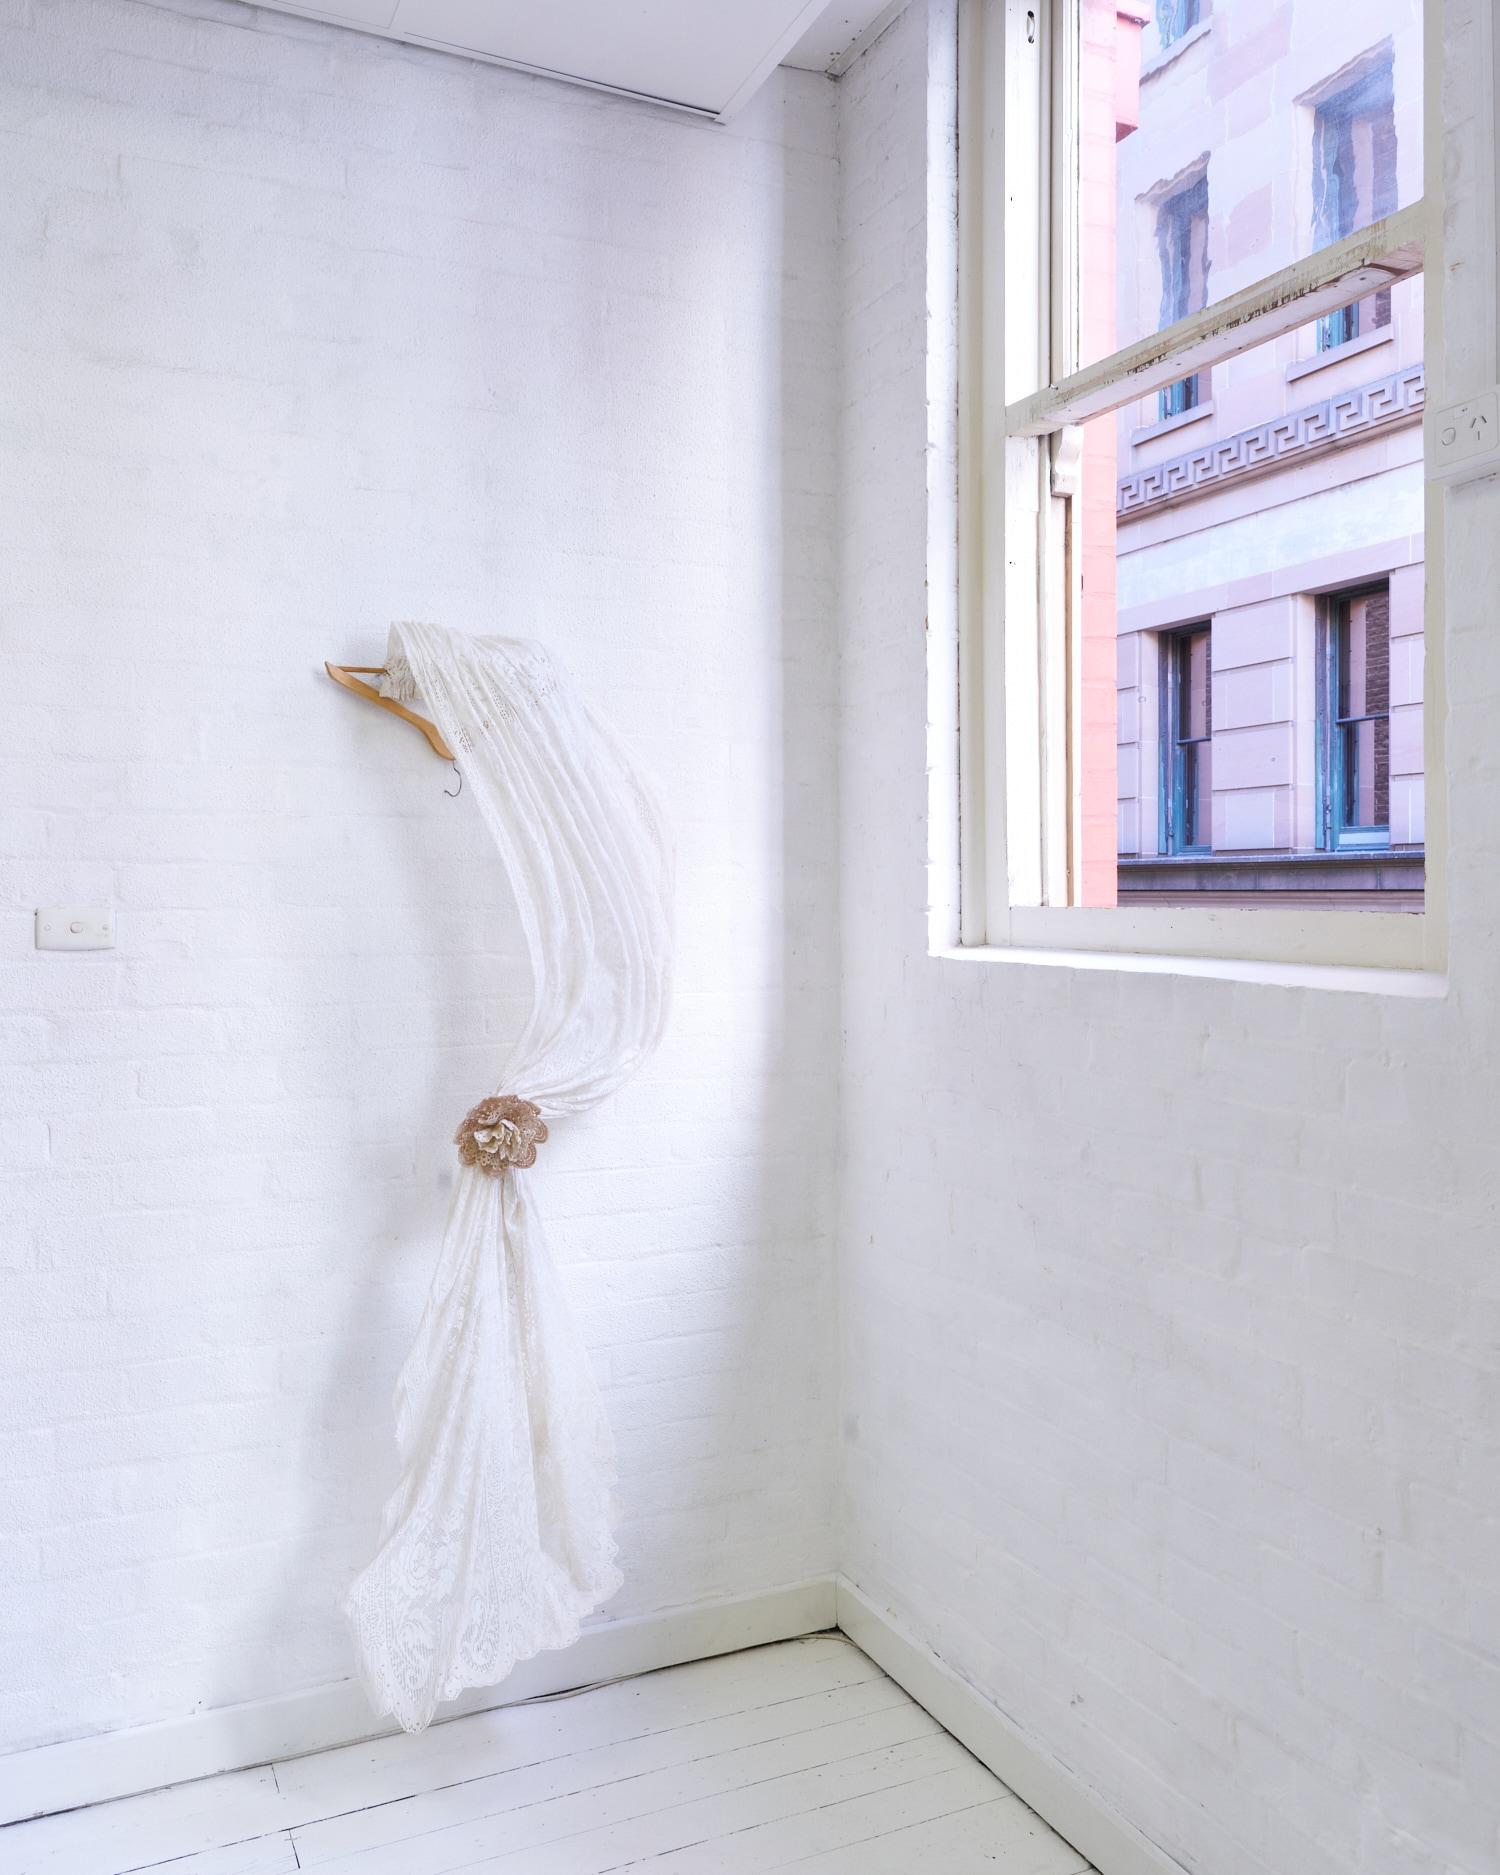 Tamara Baille,    Roman blind,  2019.   Lace curtain doilies, sugar, coat hanger.